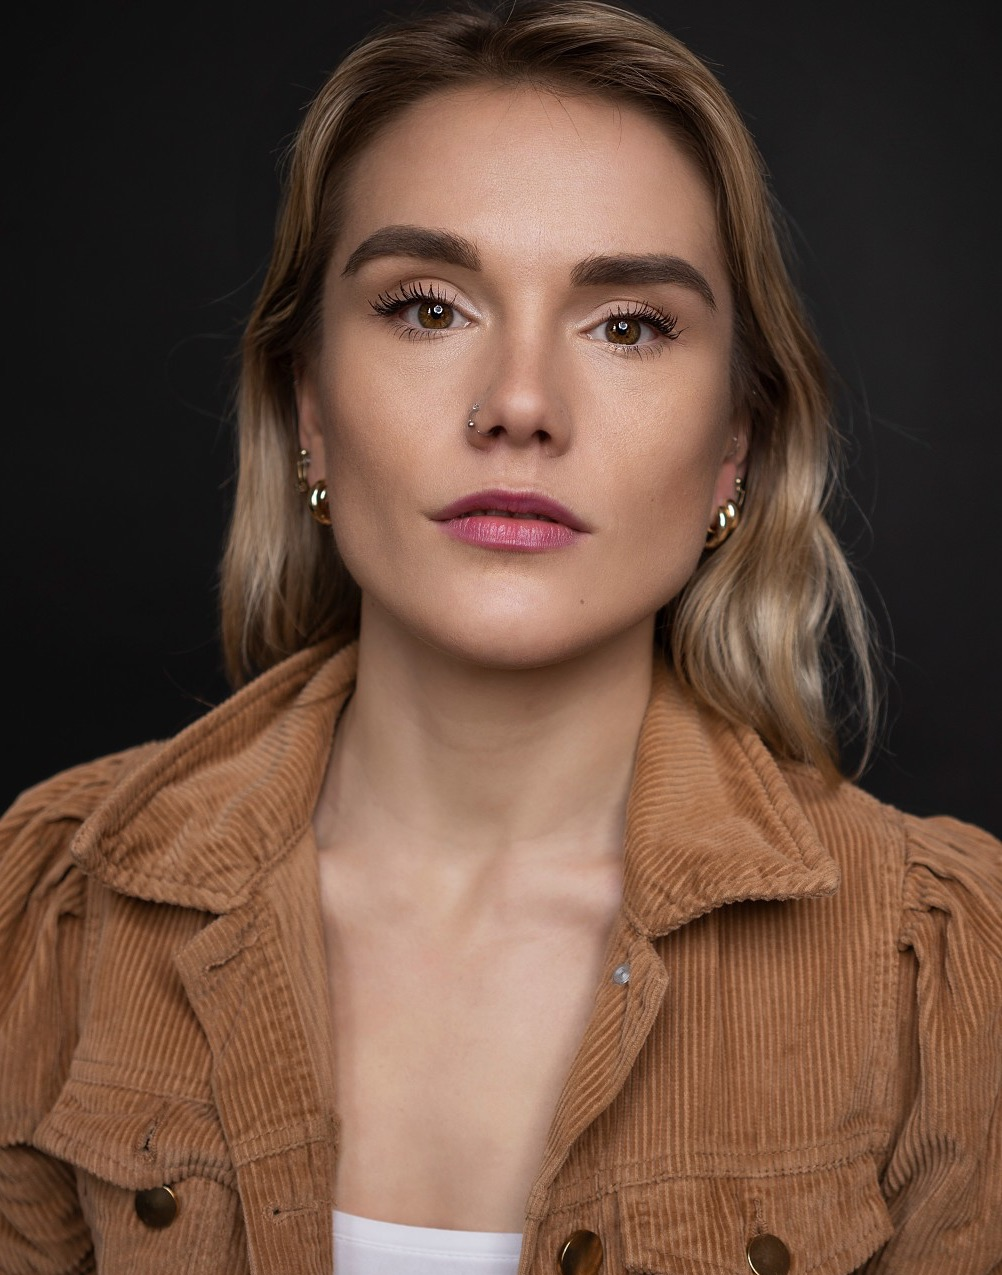 Chelsea Marie Headshot